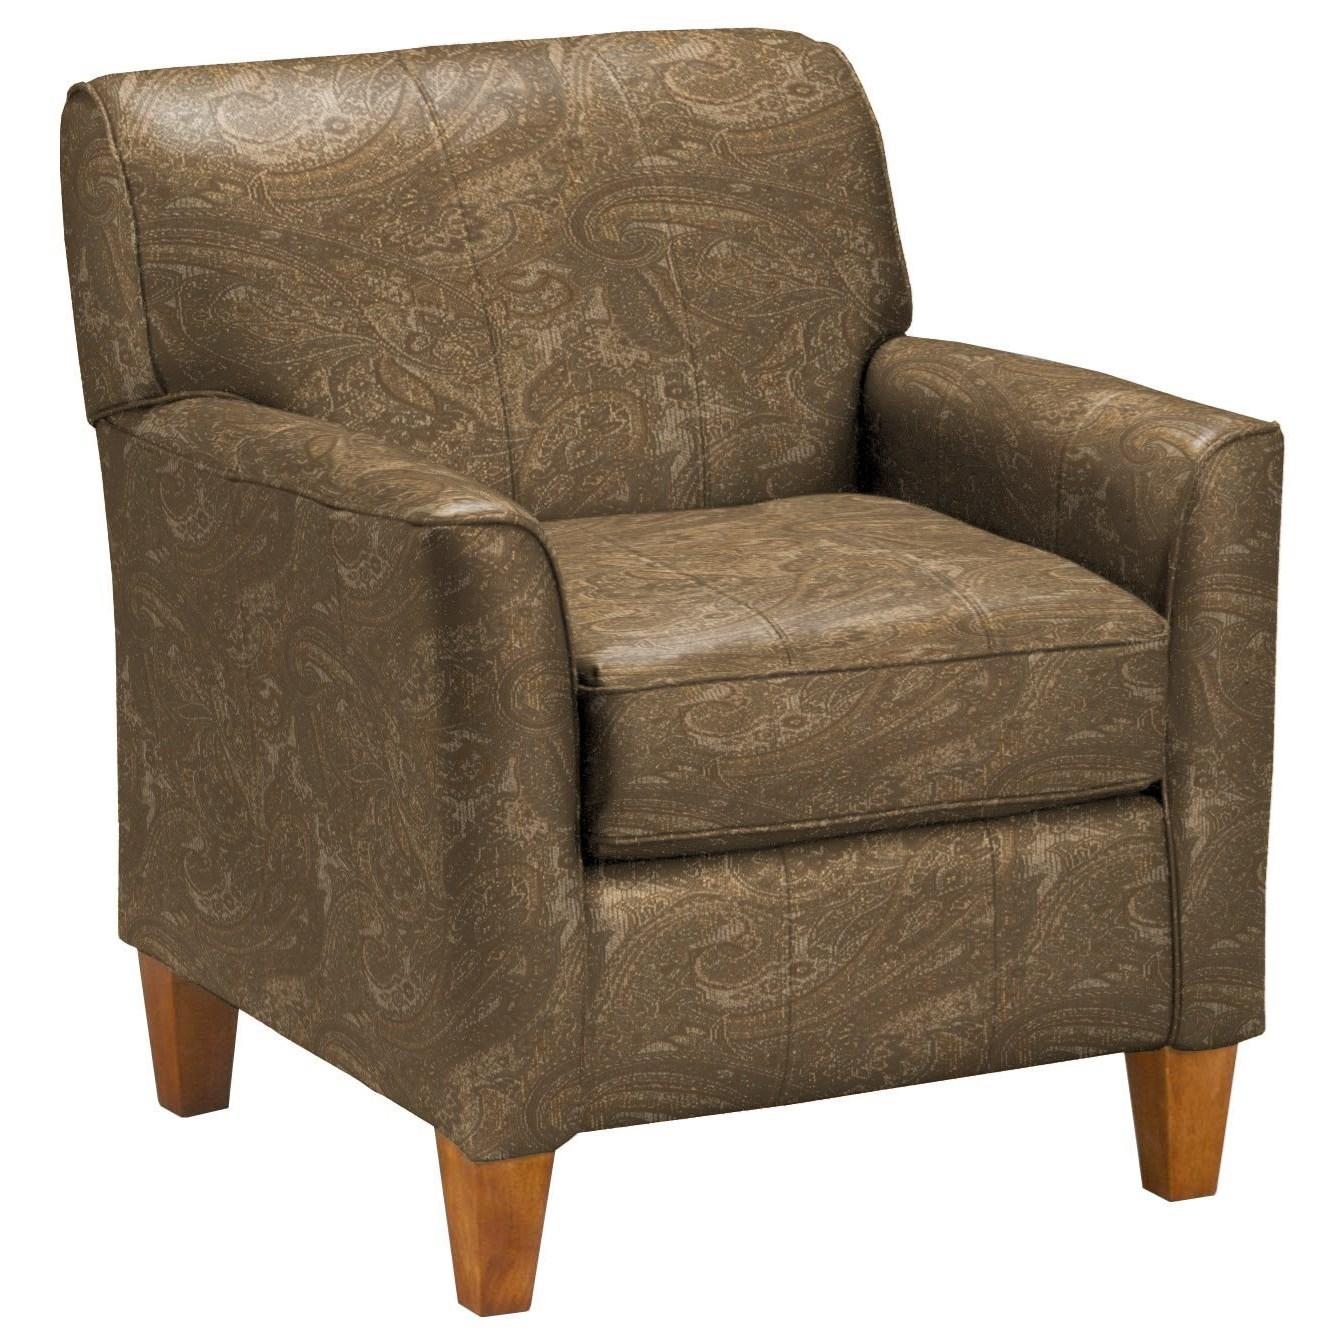 Club Chairs Risa Club Chair by Best Home Furnishings at Lucas Furniture & Mattress